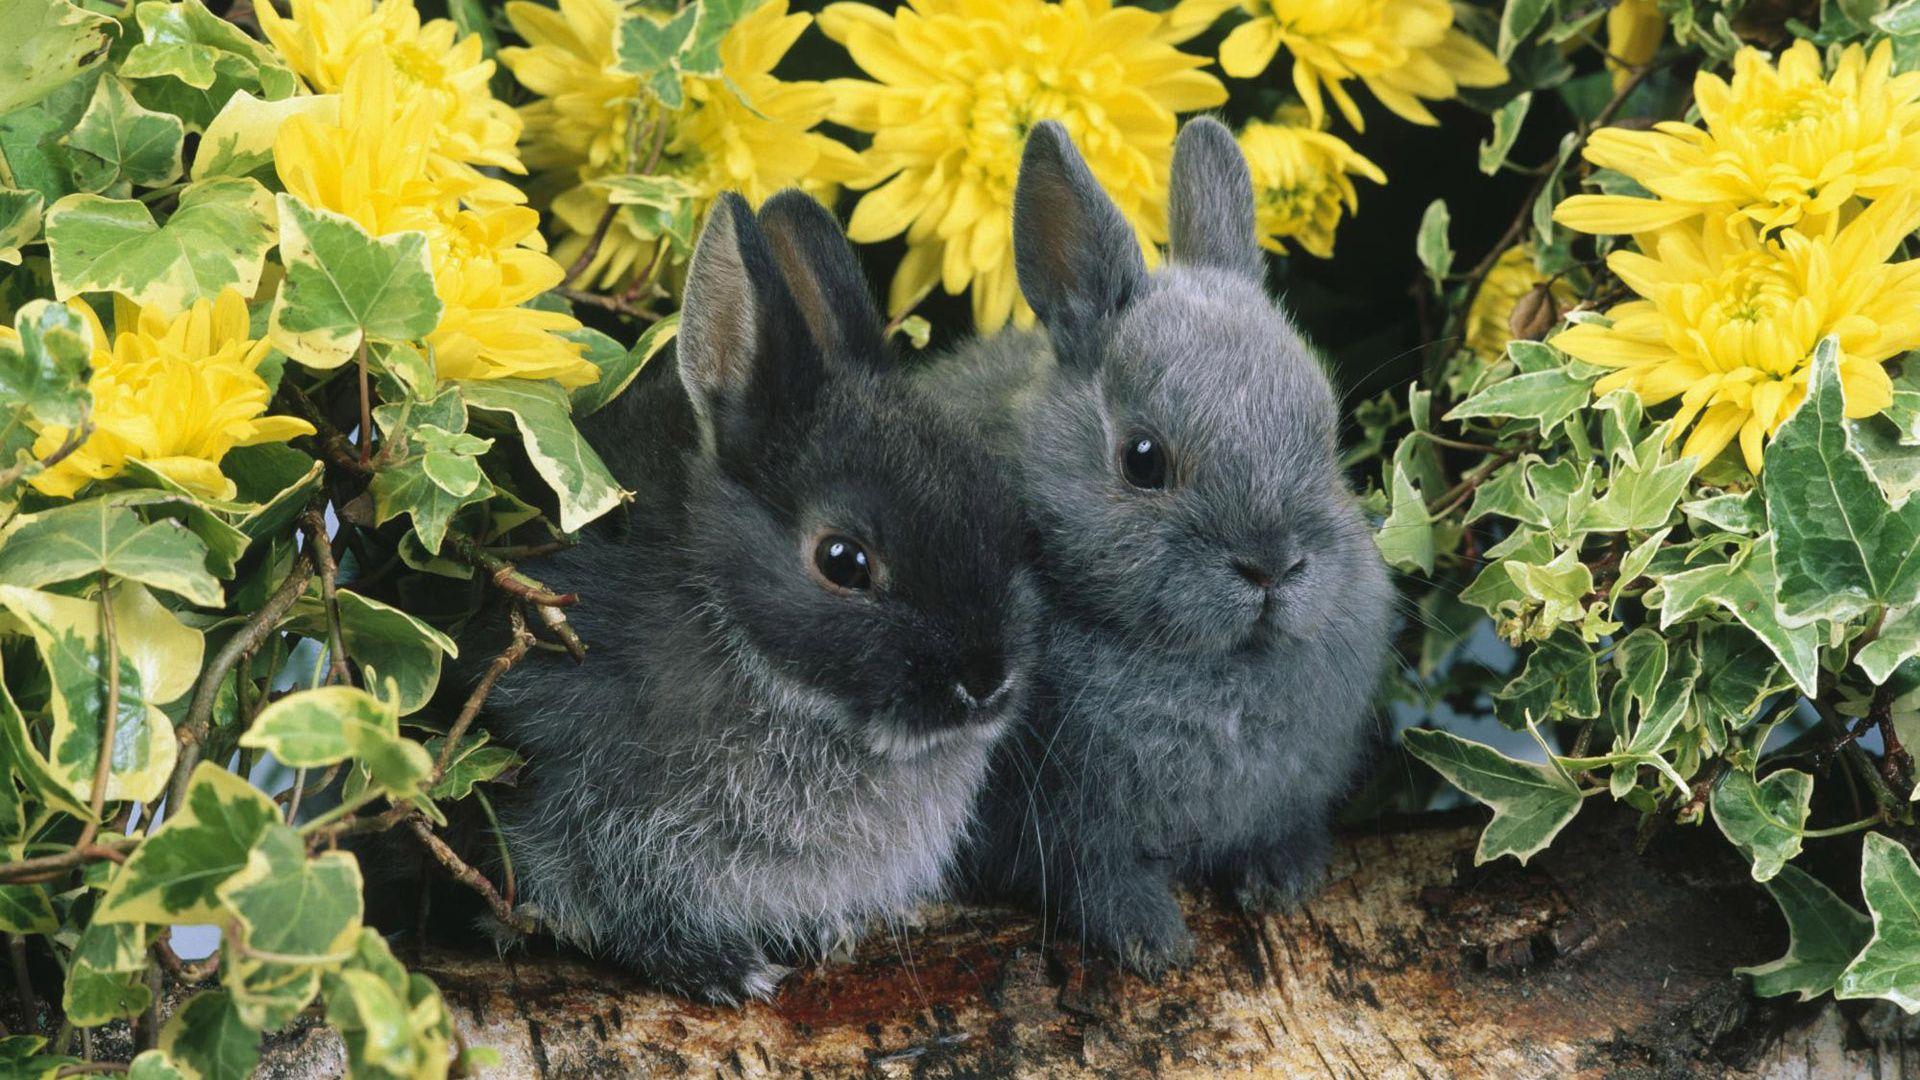 Baby Rabbits Photos